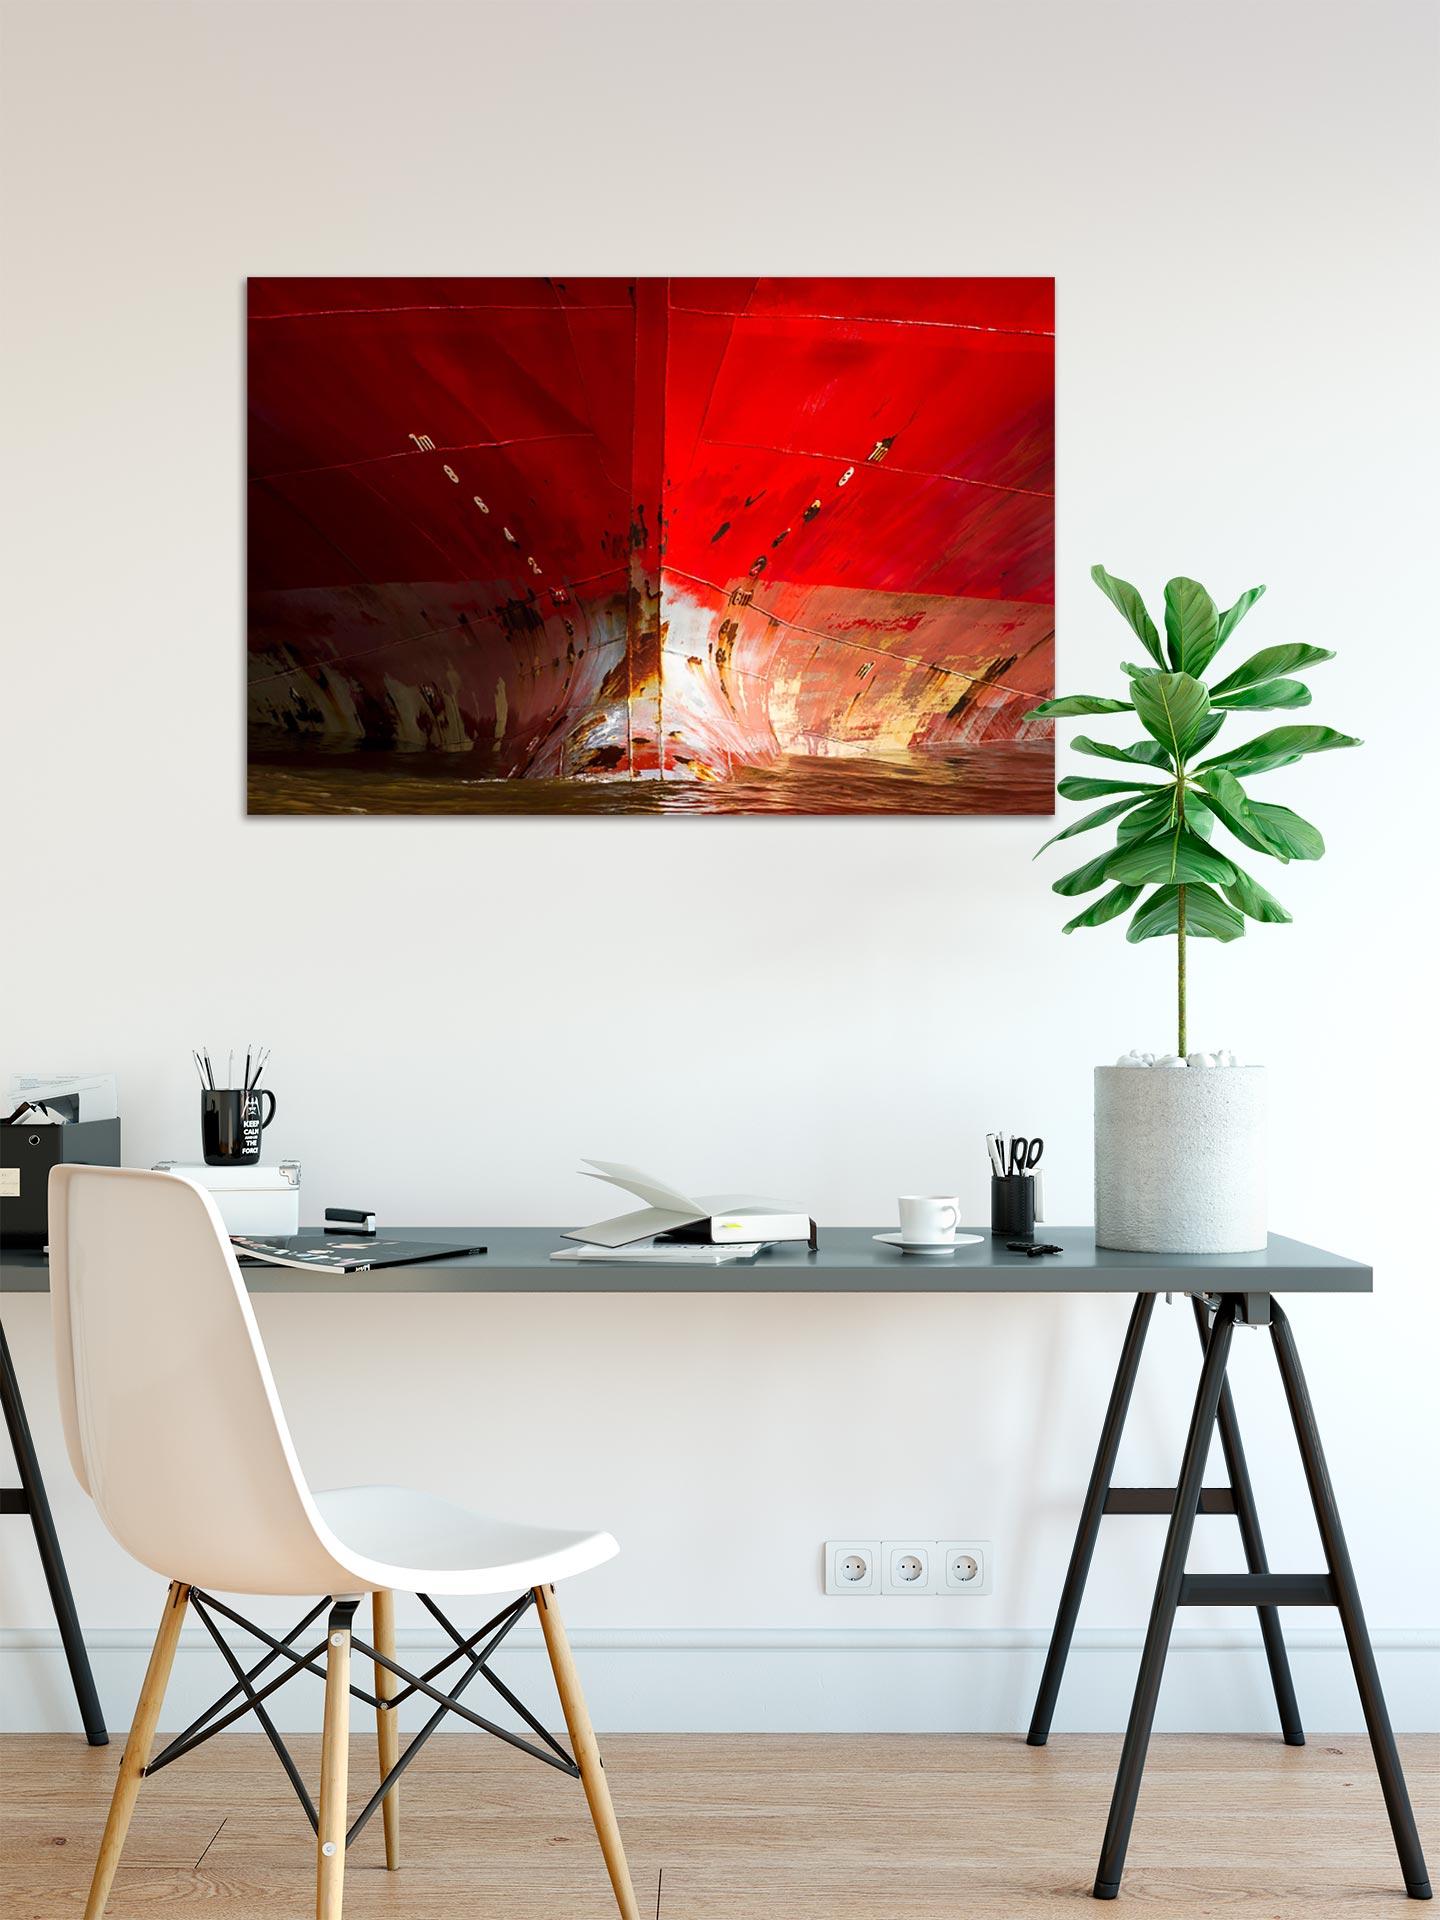 JS001-der-rote-bug-wandbild-bild-auf-leinwand-acrylglas-aludibond-arbeitszimmer